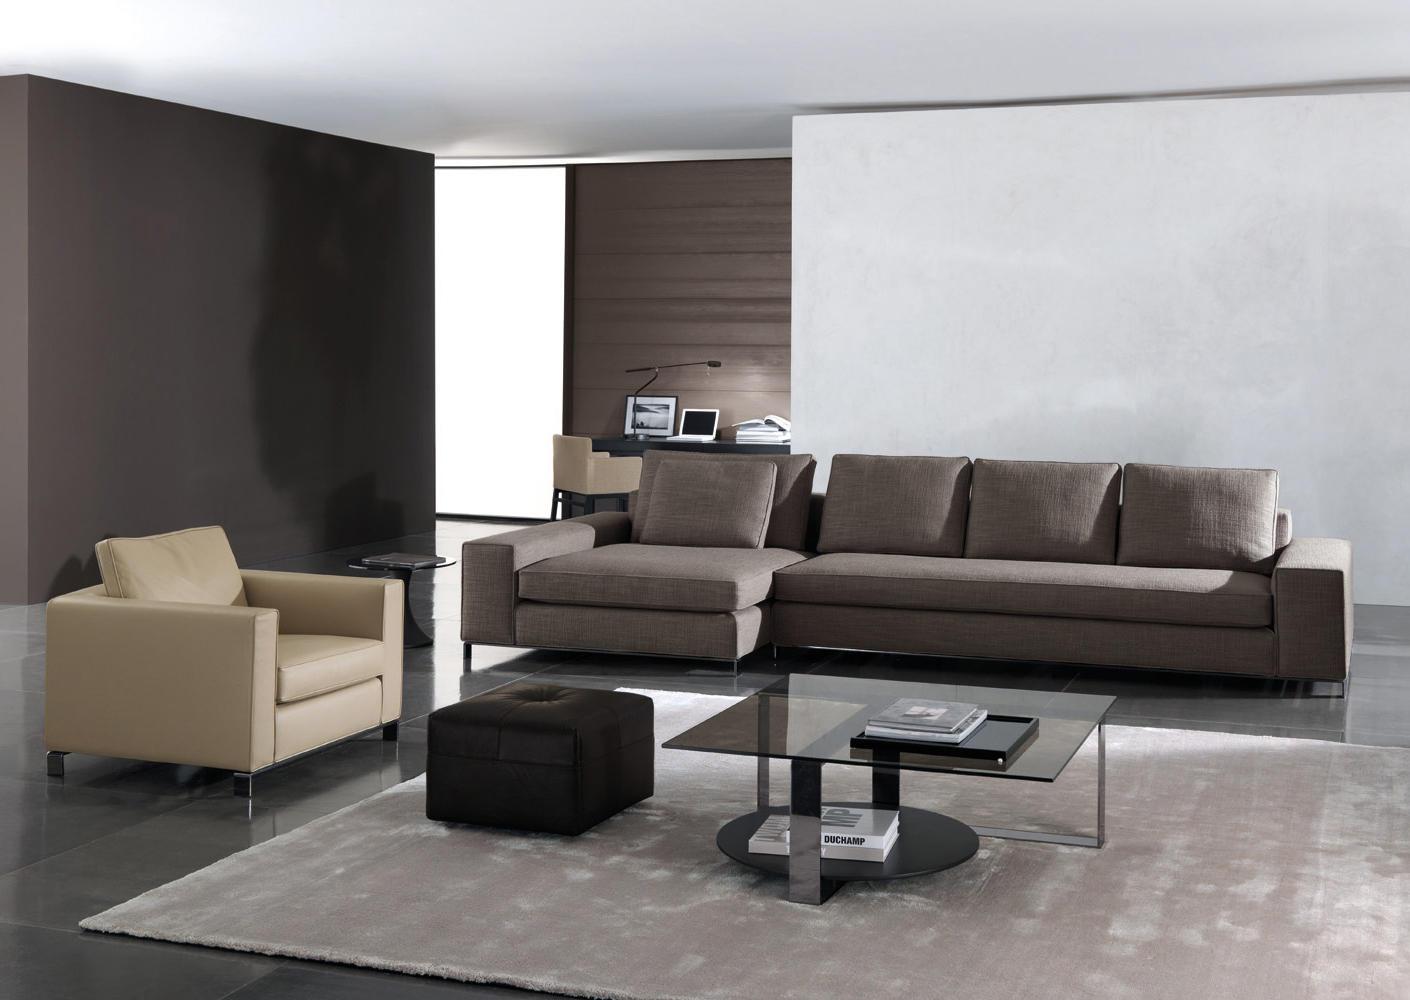 WILLIAMS - Lounge sofas from Minotti  Architonic